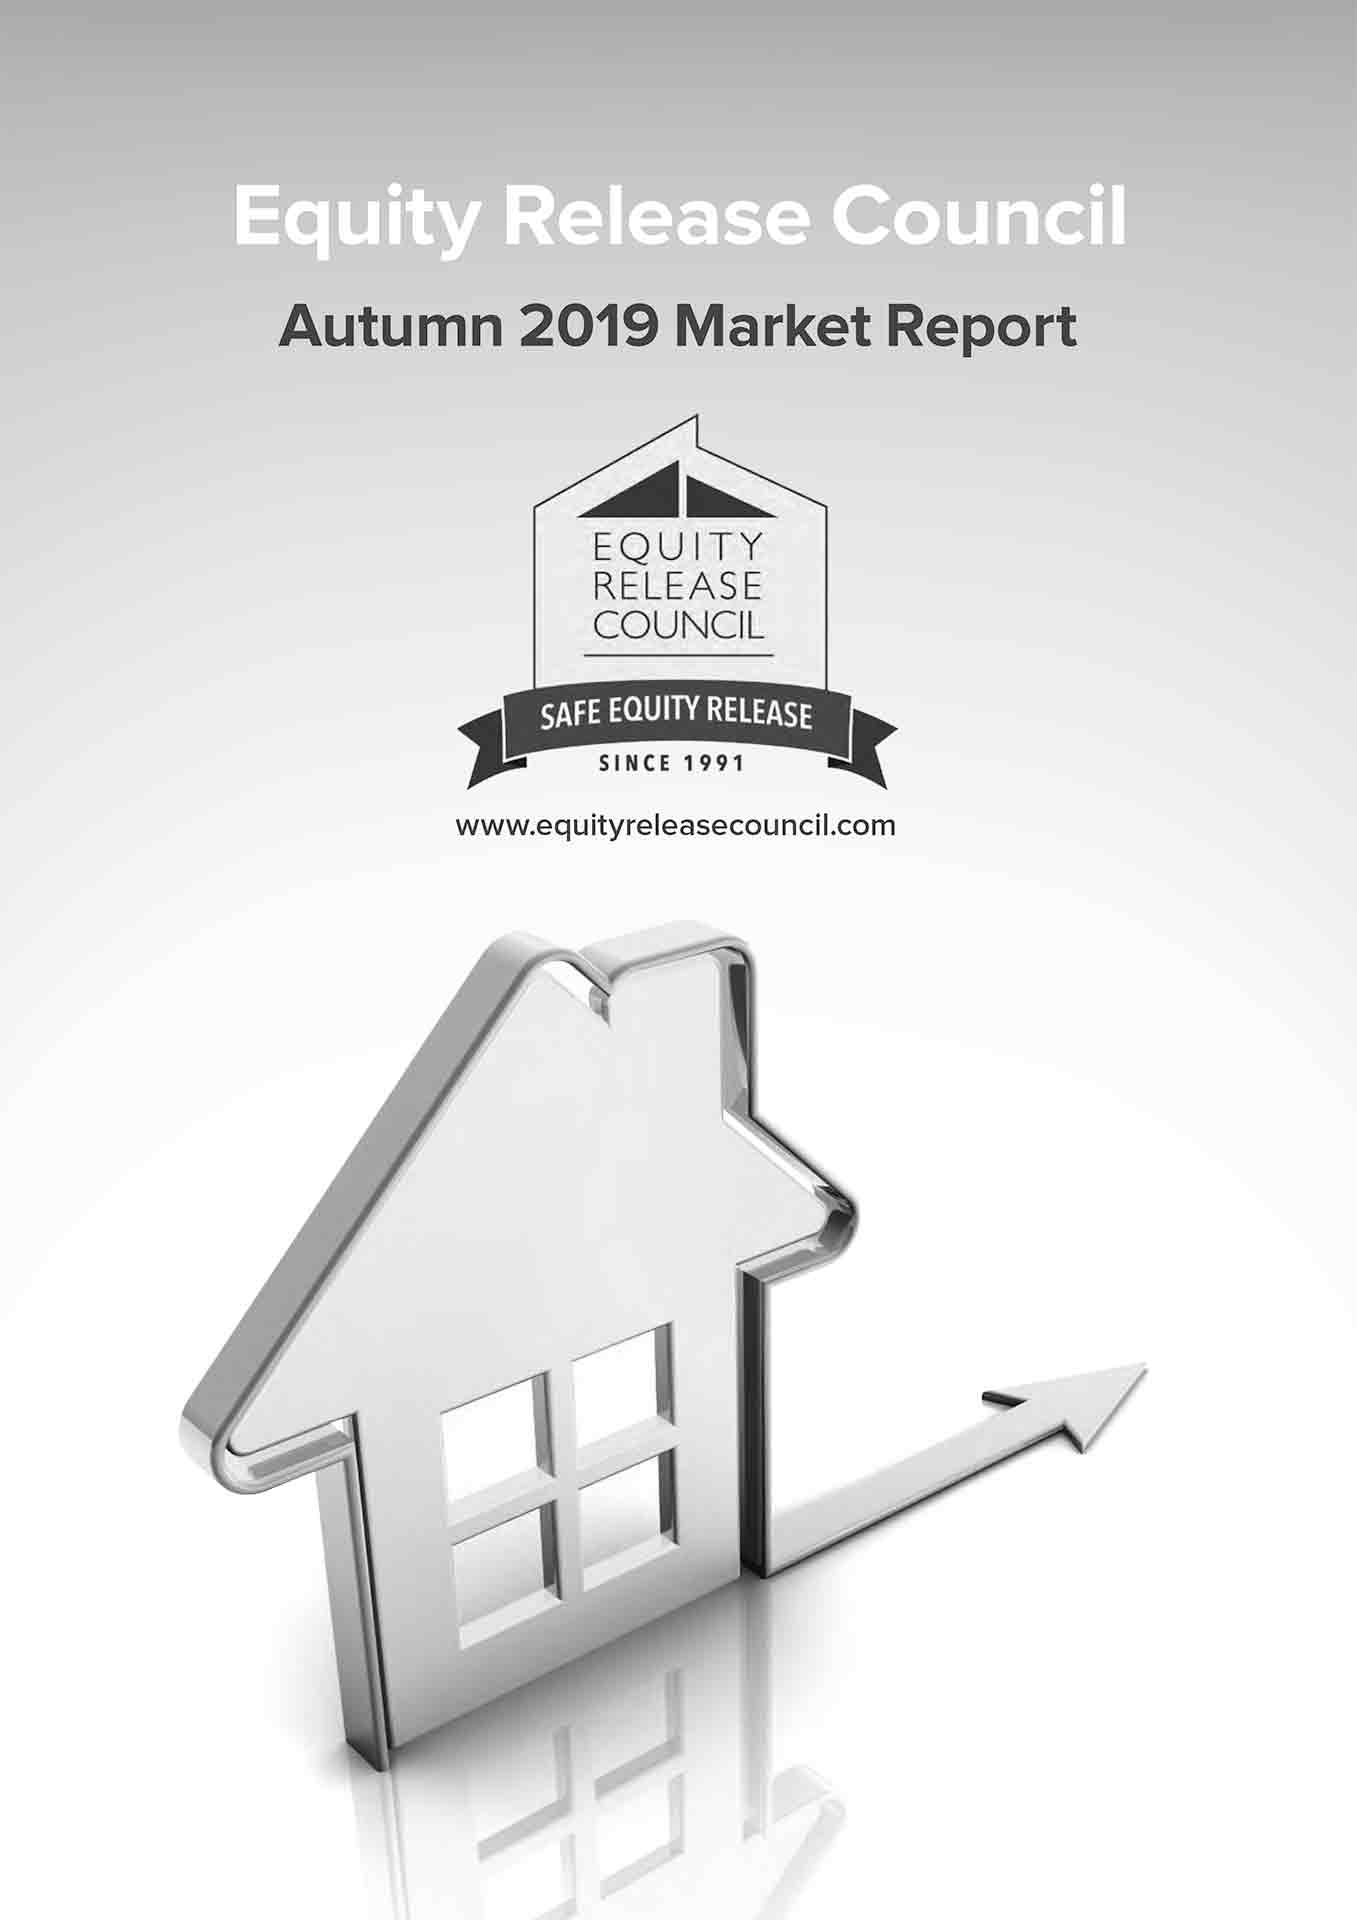 Equity Release Council Autumn 2019 Market Report